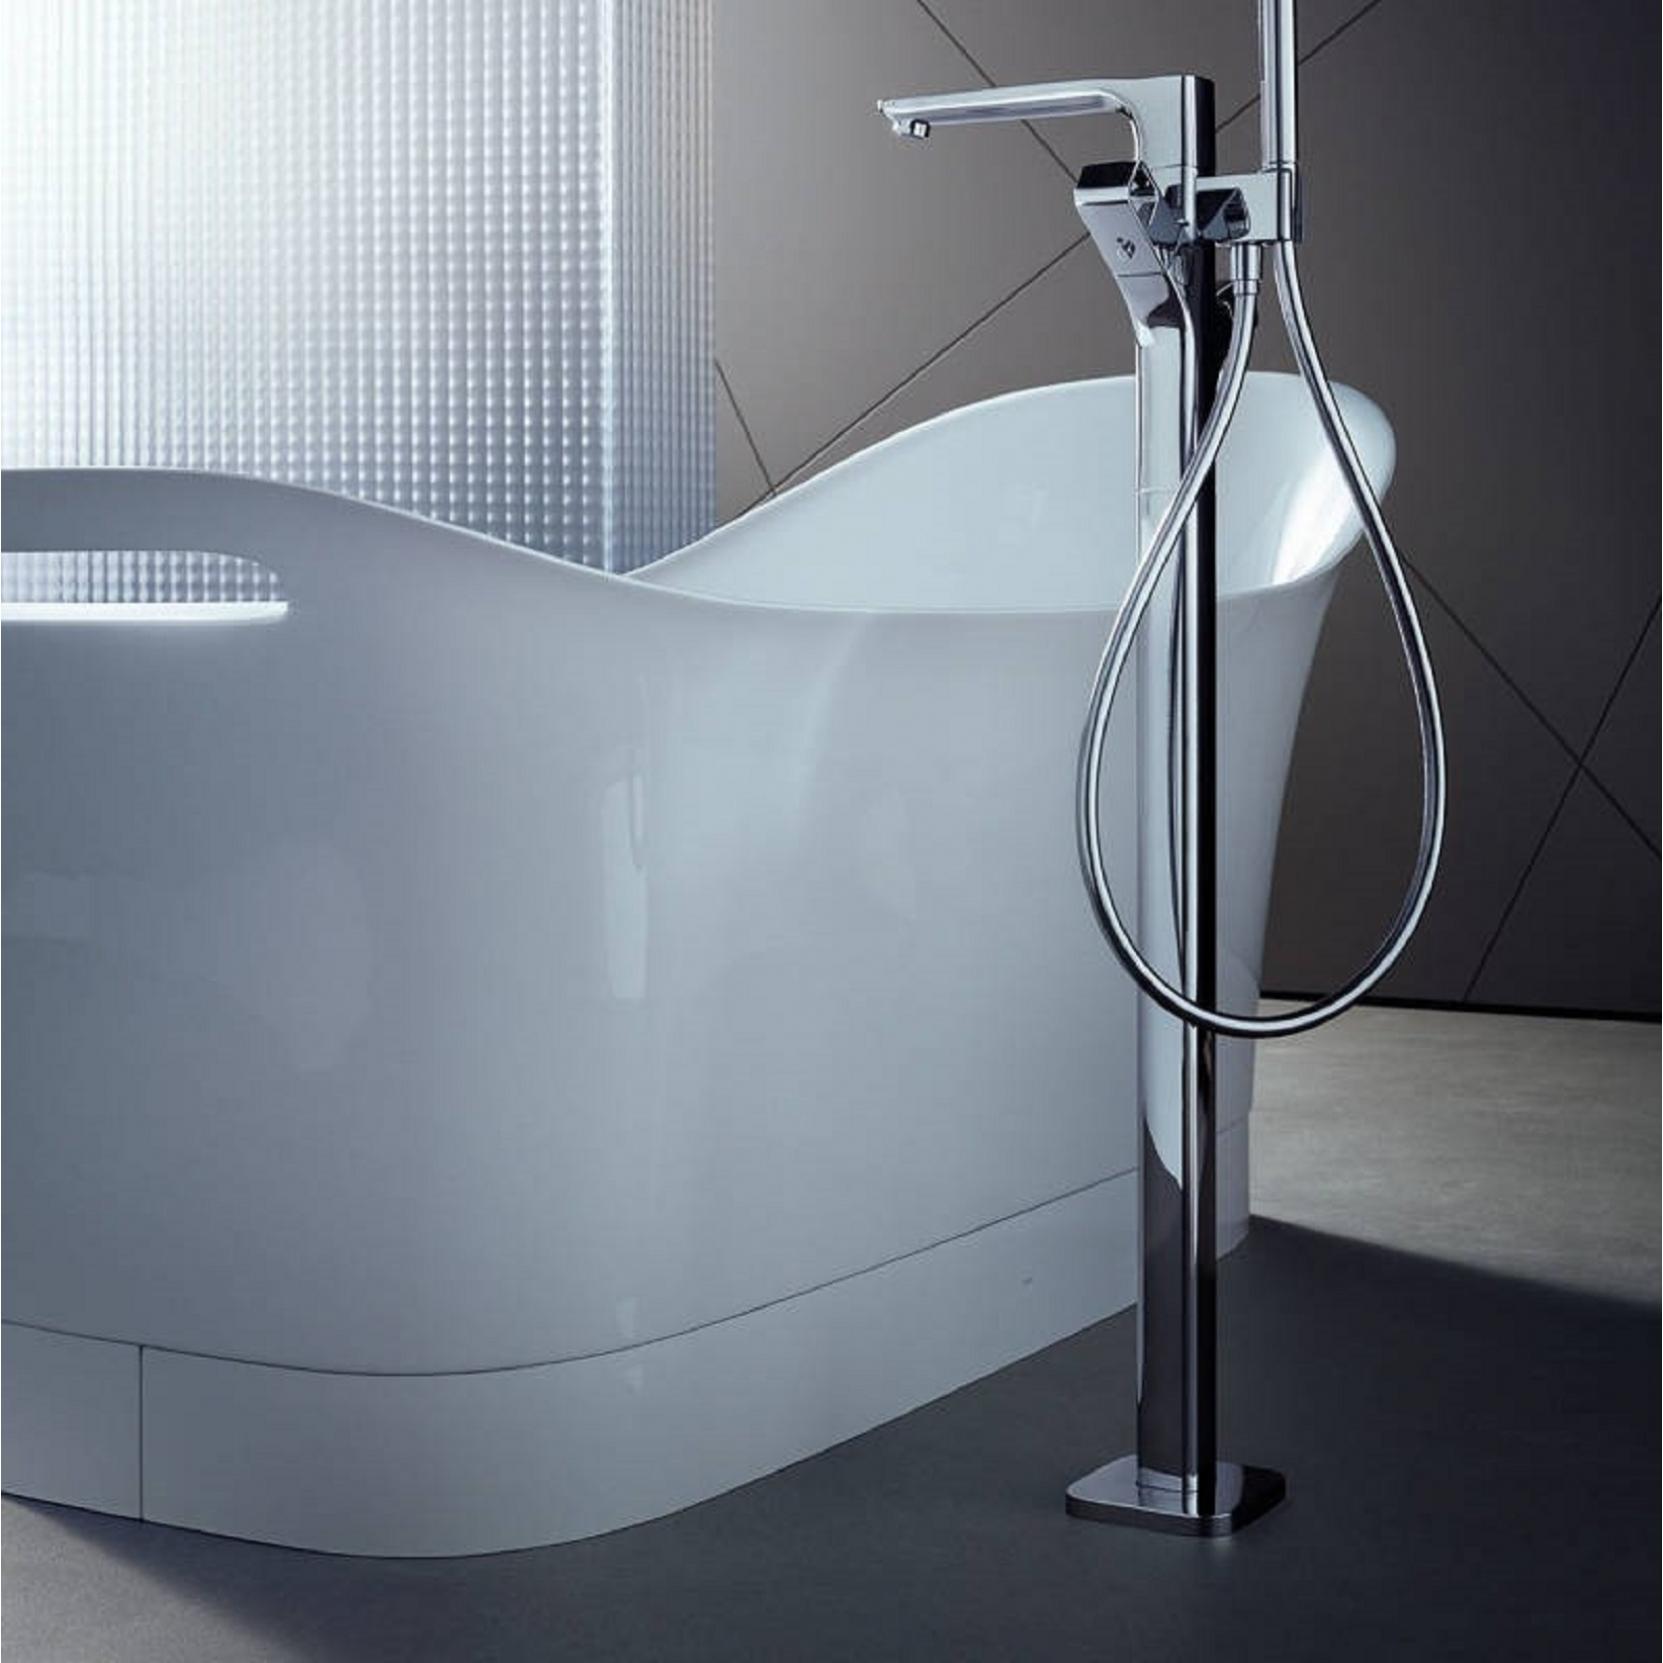 axor hansgrohe urquiola freestanding buthtab tattahome. Black Bedroom Furniture Sets. Home Design Ideas